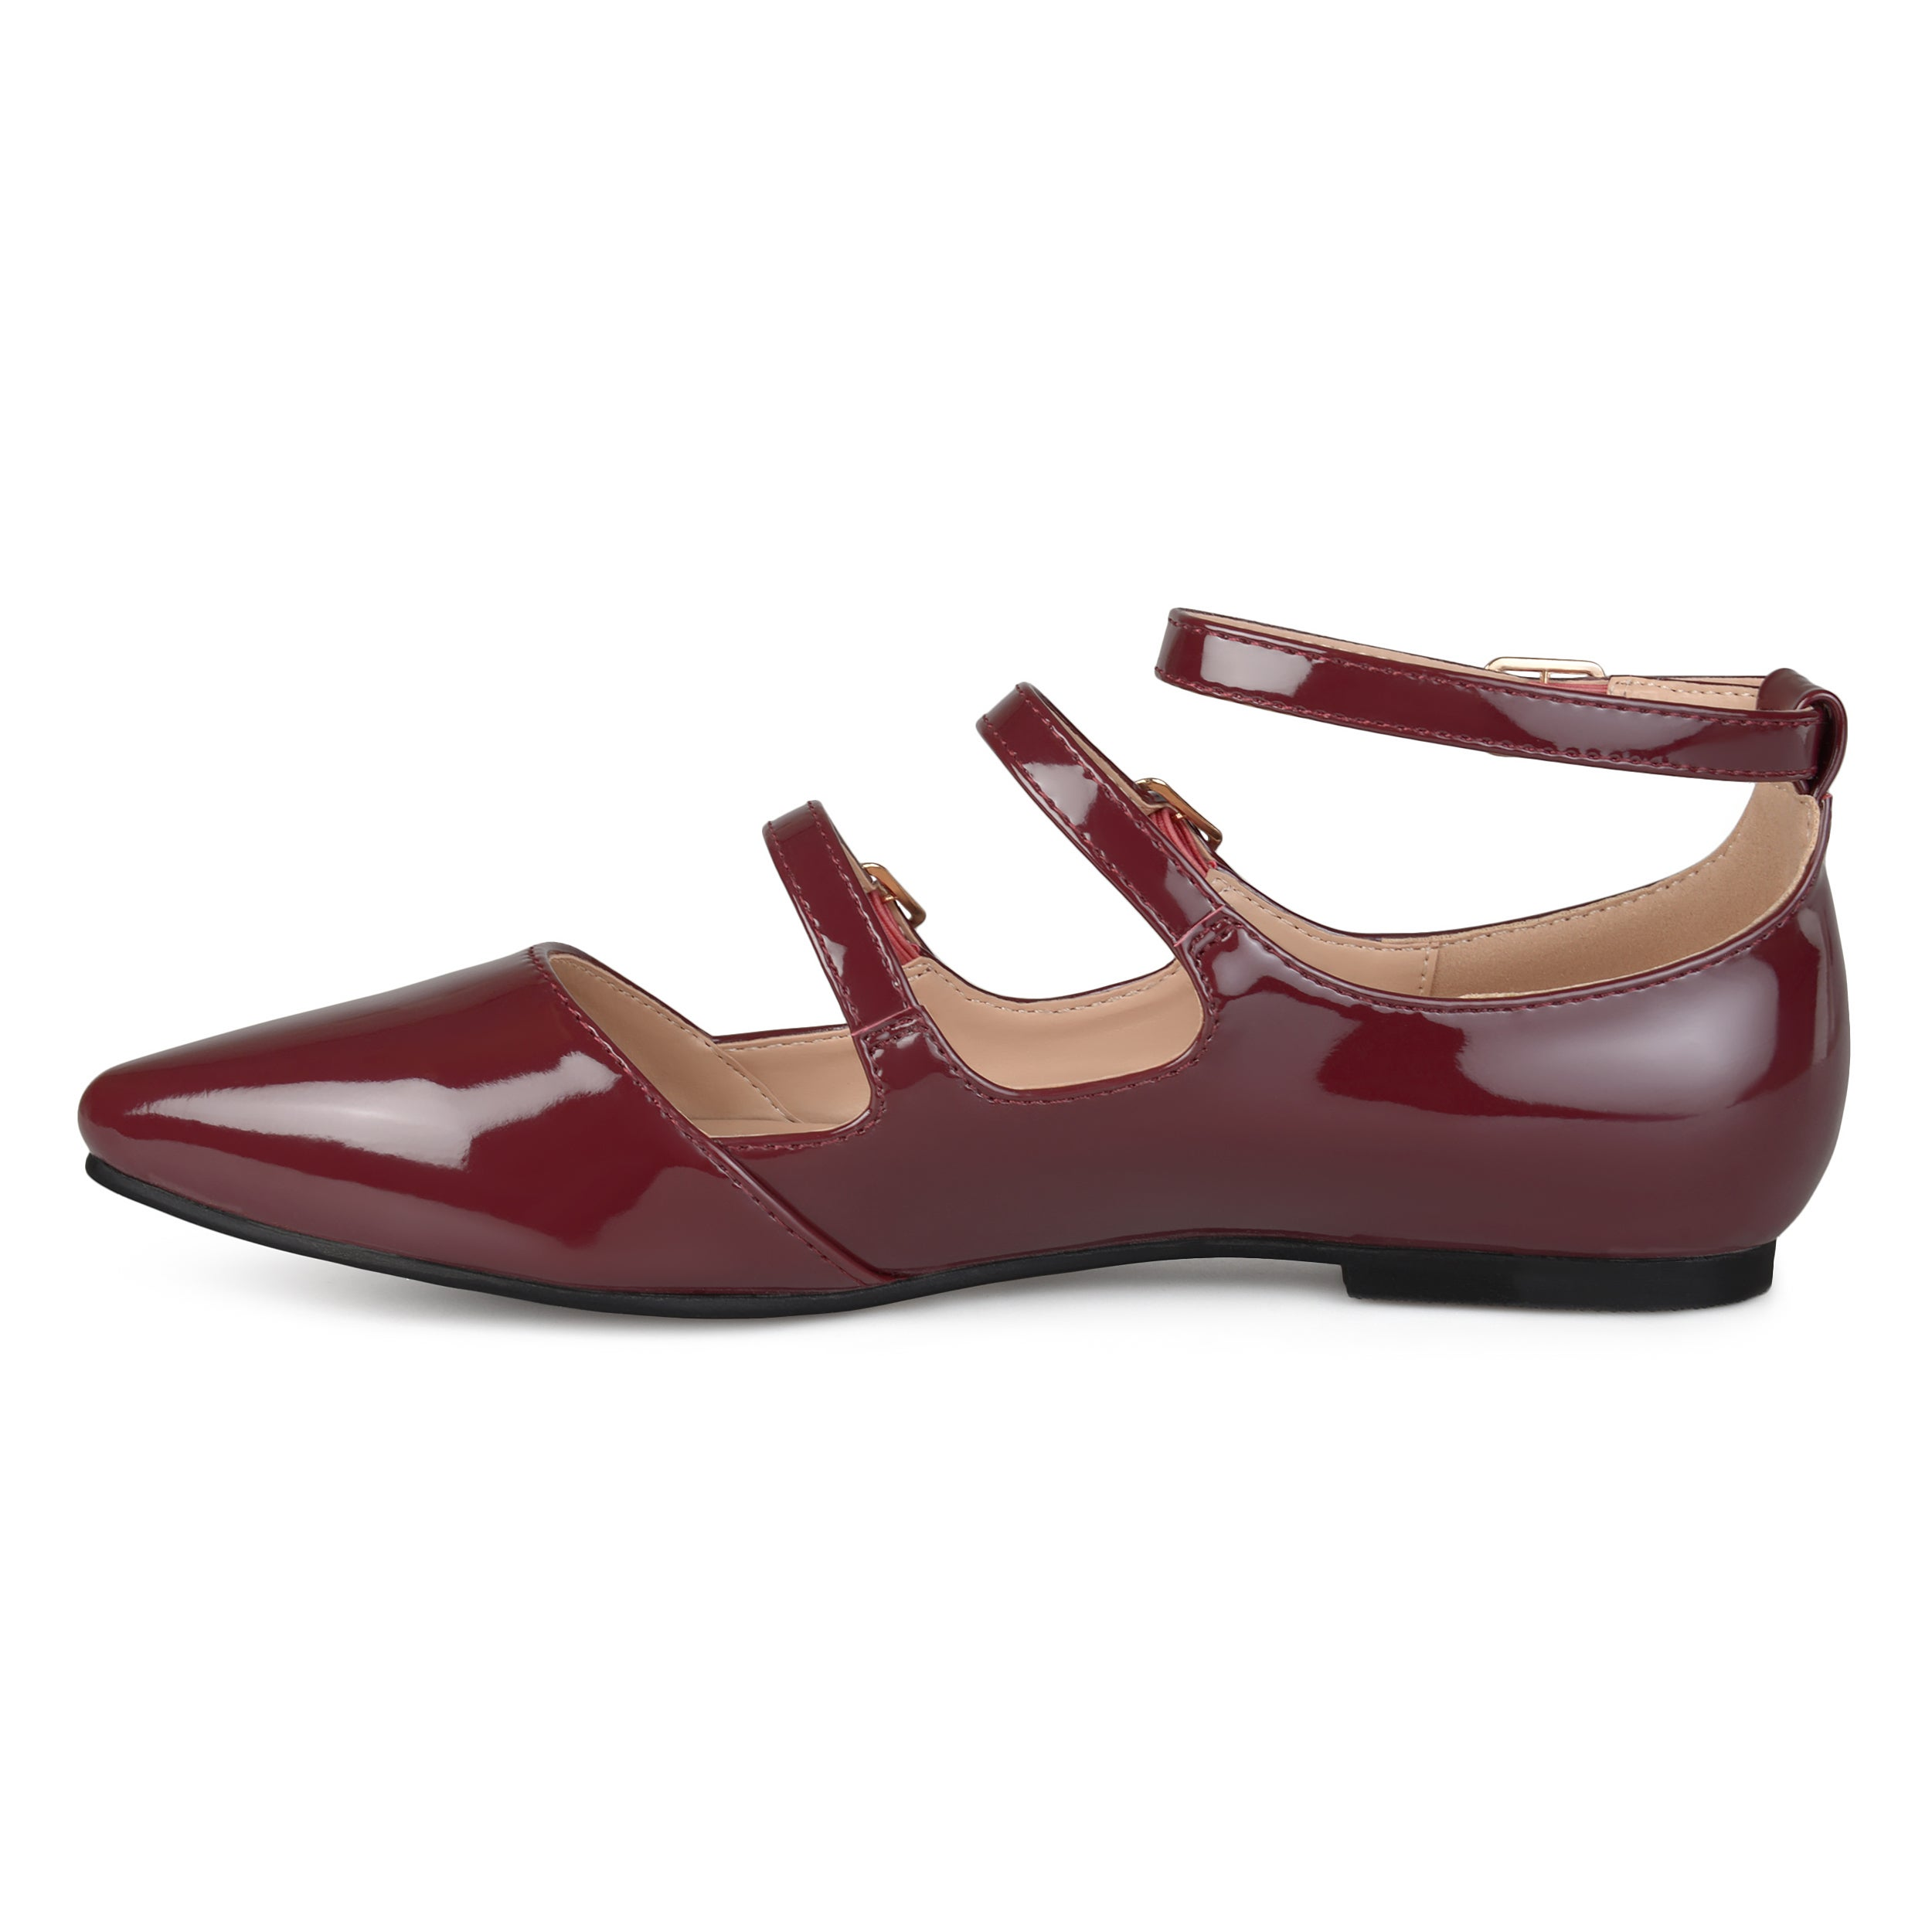 Journee Collection Essie ... Women's Flats PrTS9OY1C